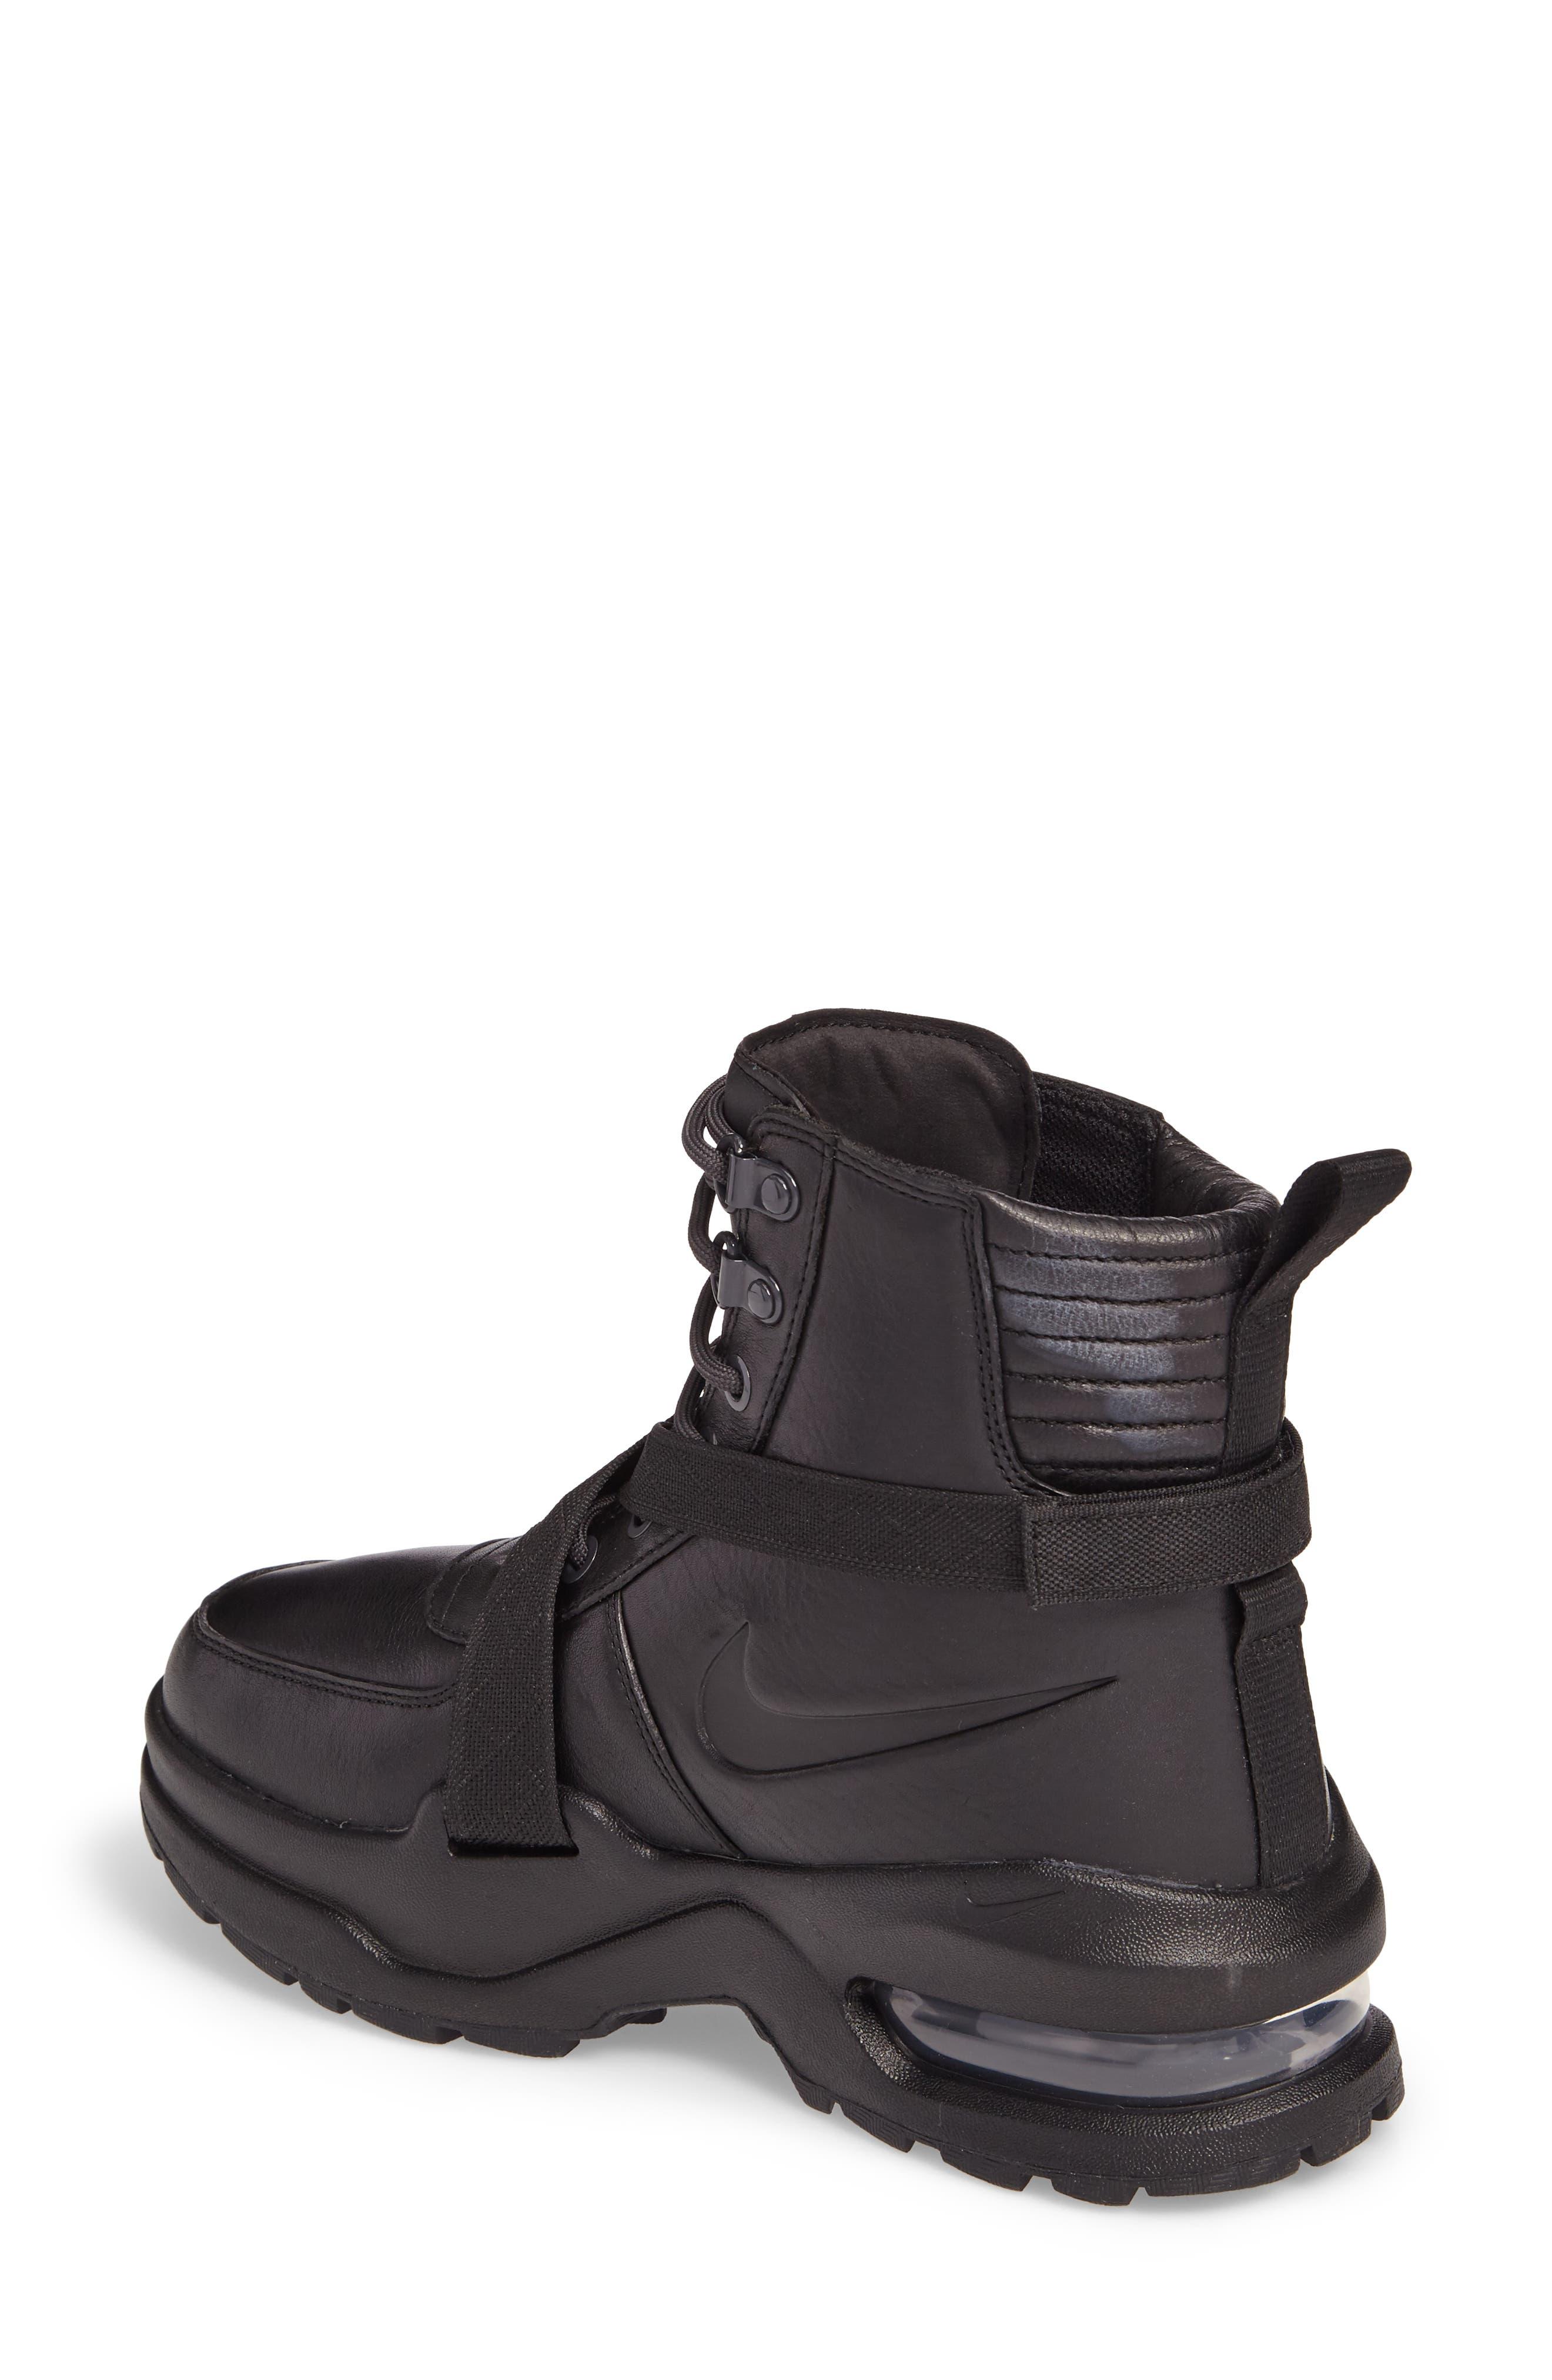 Air Max Goadome Sneaker Boot,                             Alternate thumbnail 2, color,                             BLACK/ ANTHRACITE/ BLACK